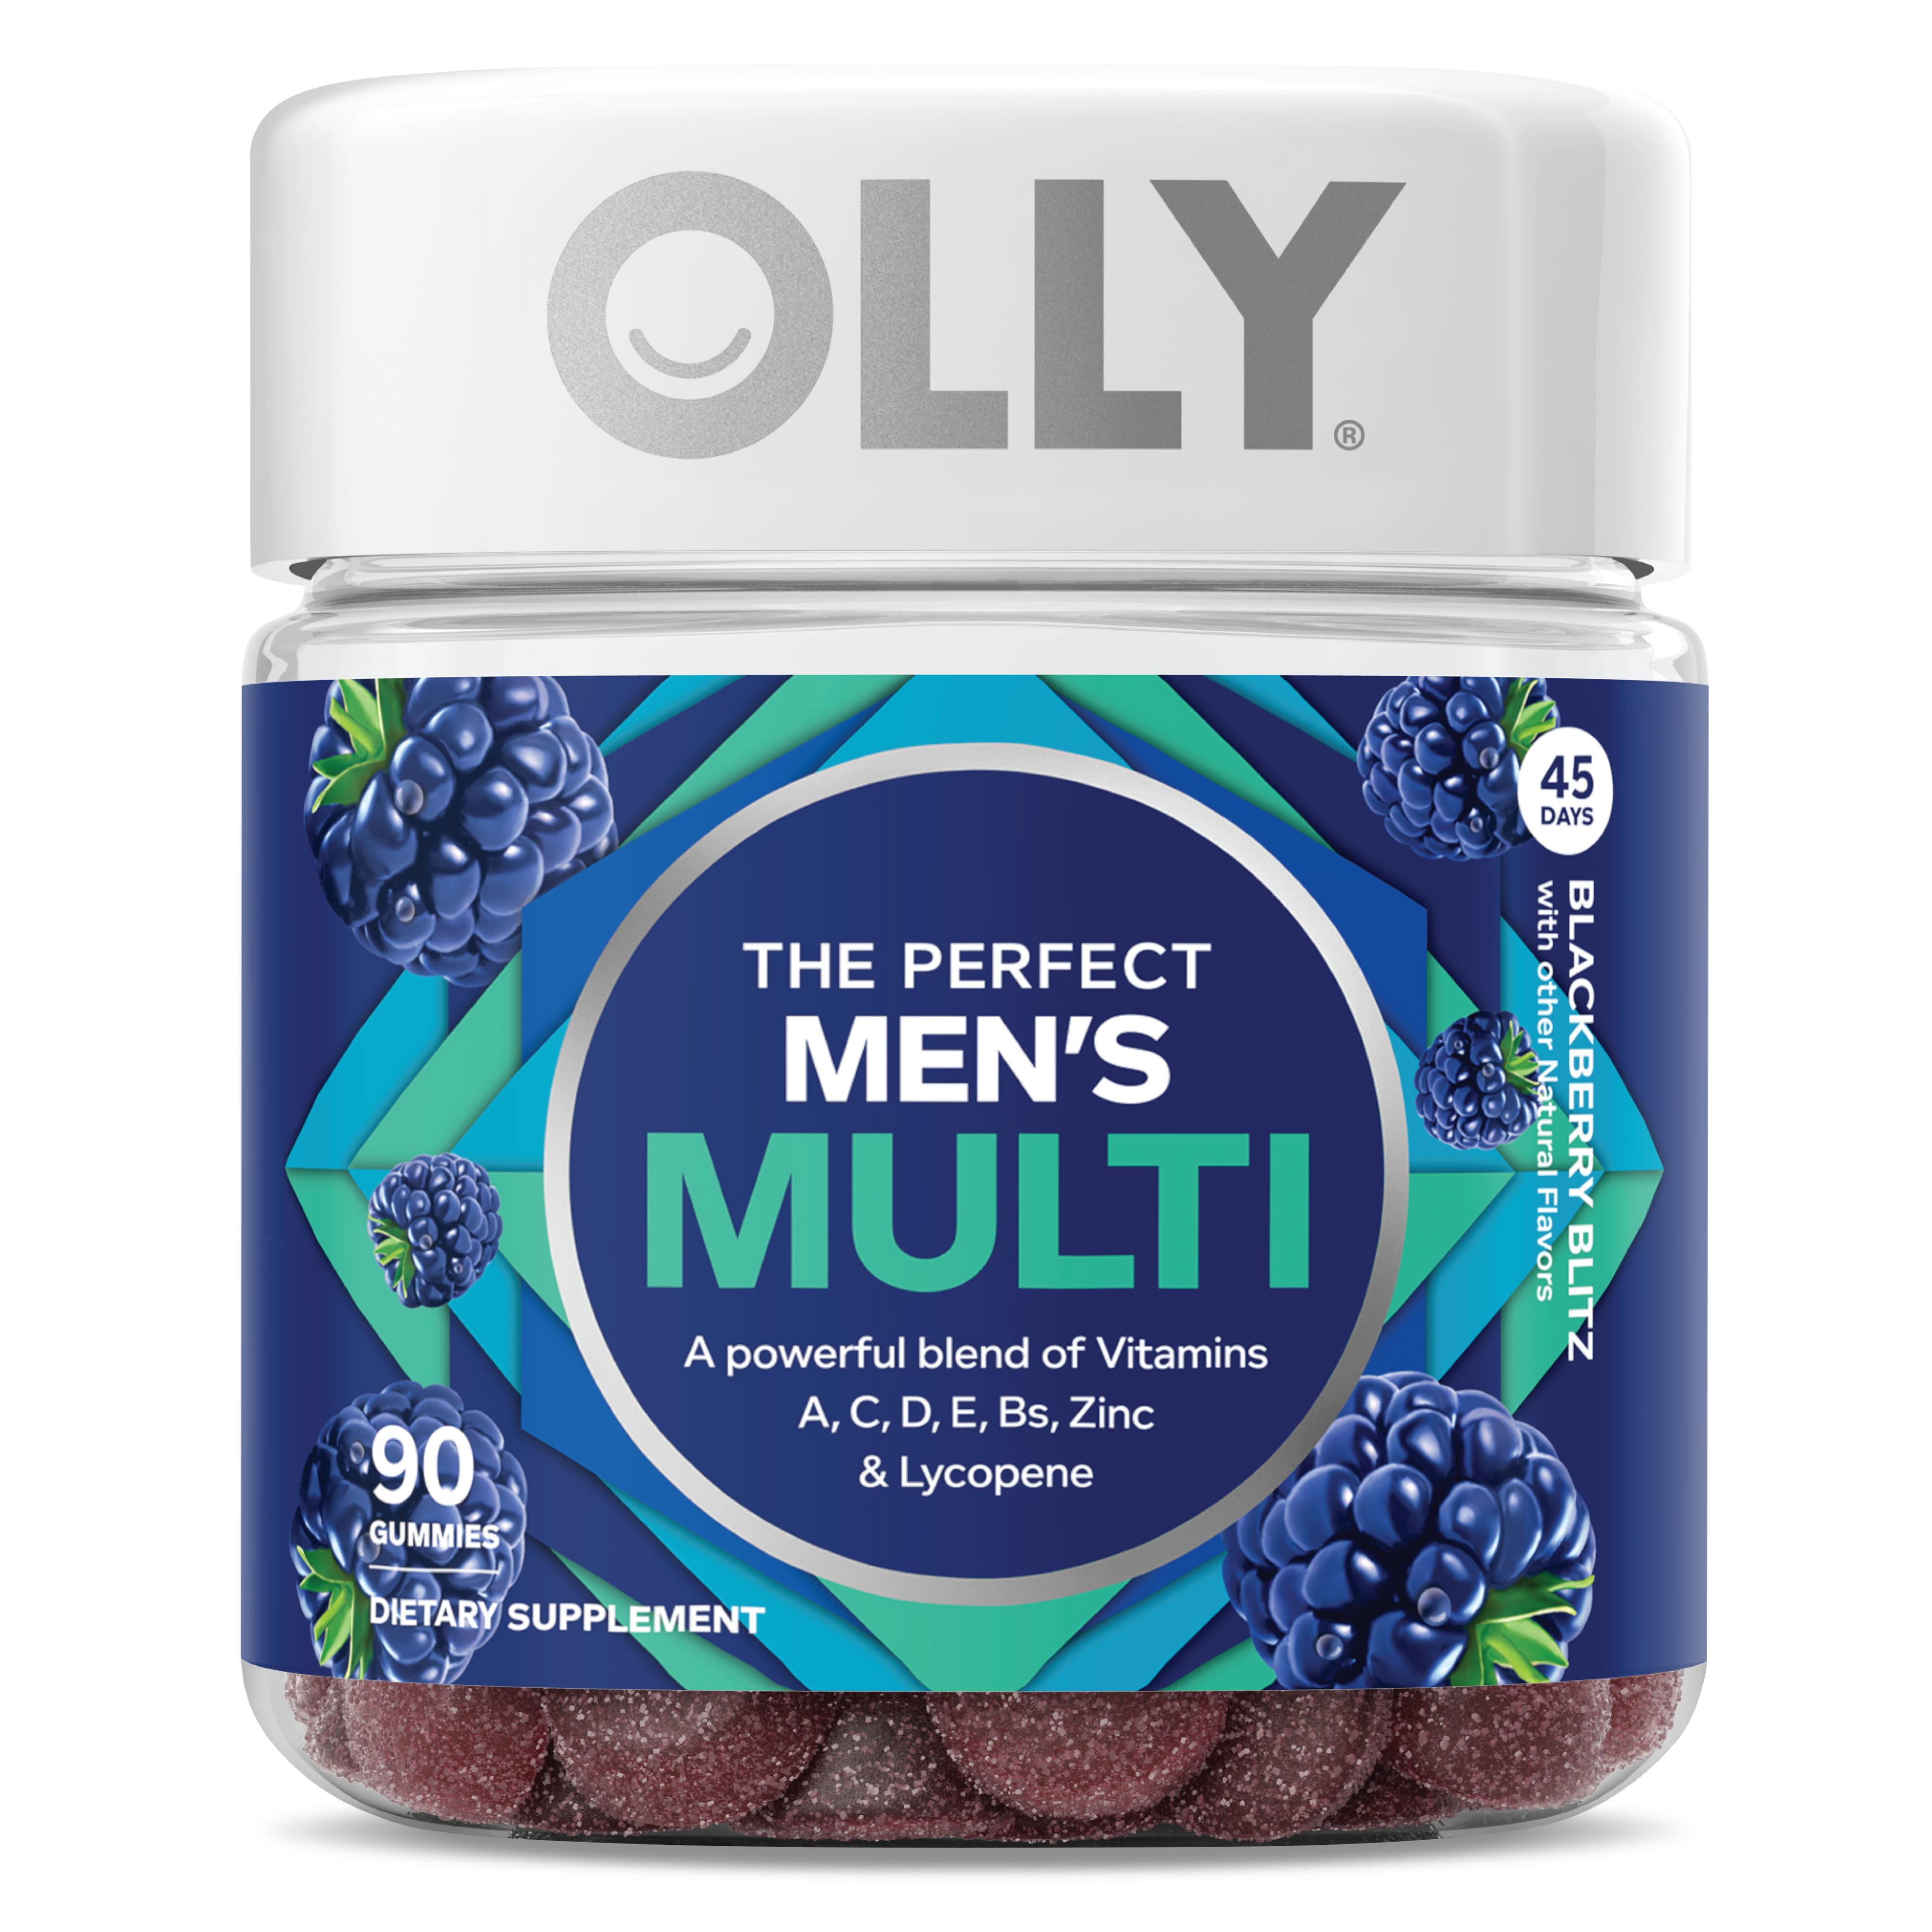 OLLY The Perfect Men's Multi, Multivitamin Gummies, Blackberry, 90 Ct